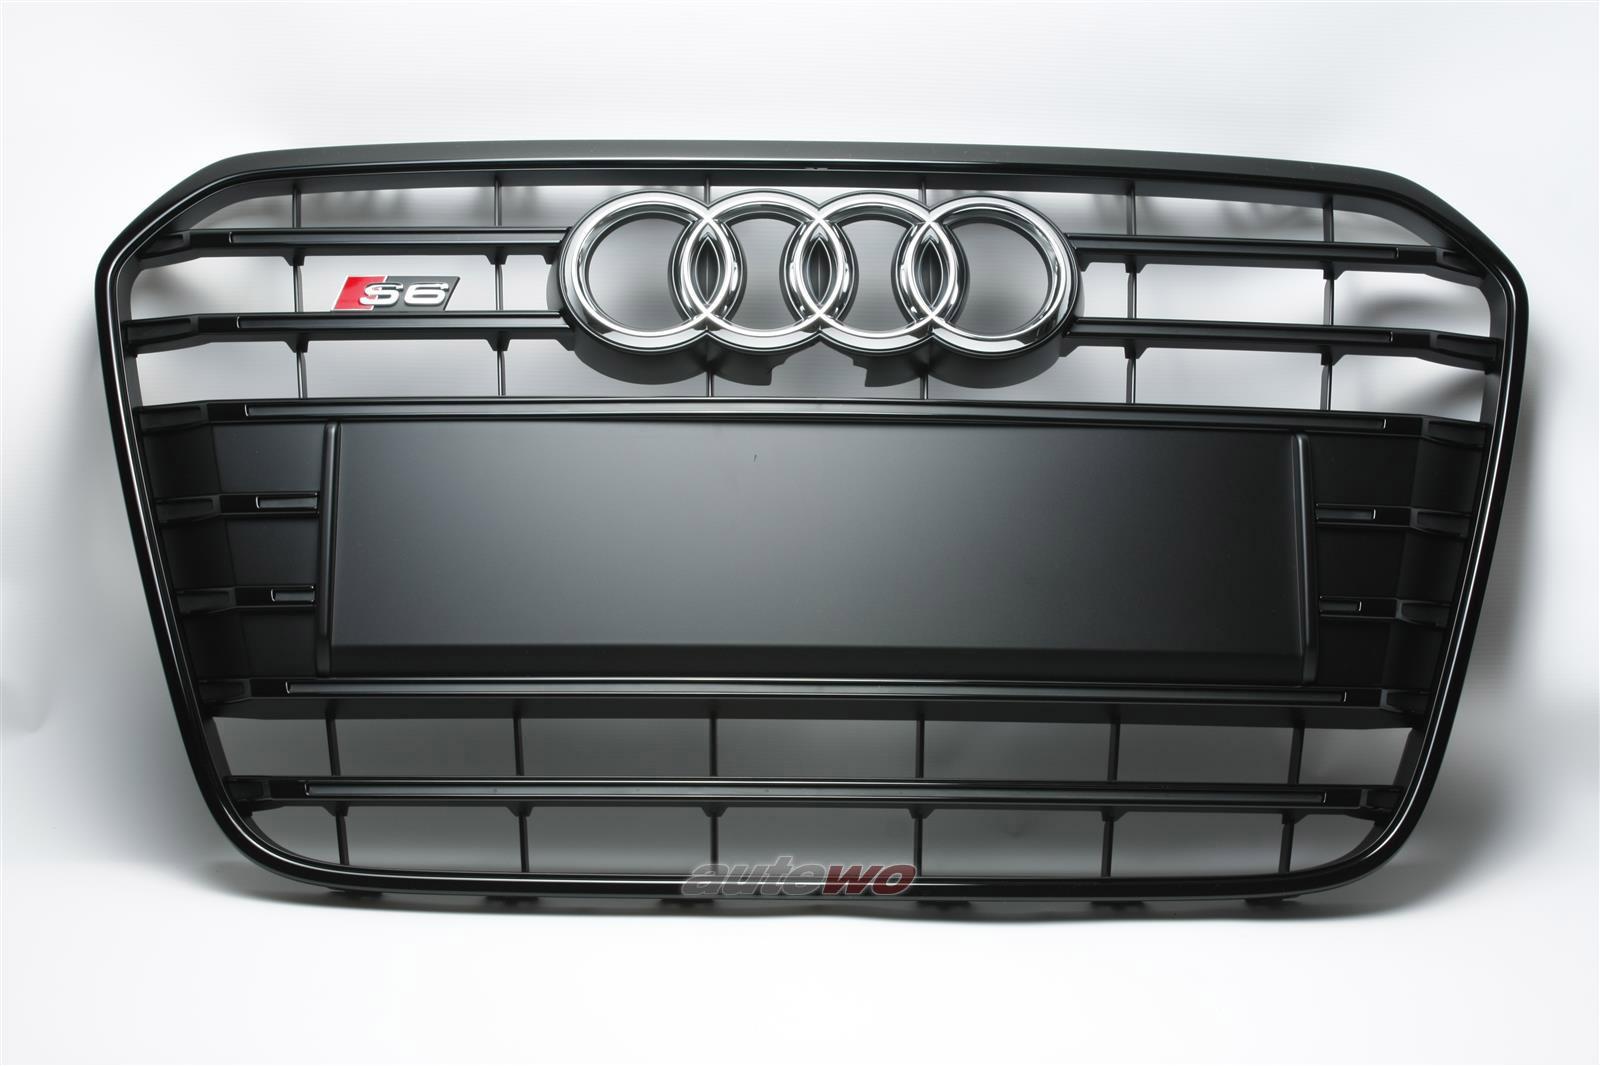 4G0853651S NEU Audi S6 4G Kühlergrill mit S6 Emblem CKA schwarz-matt